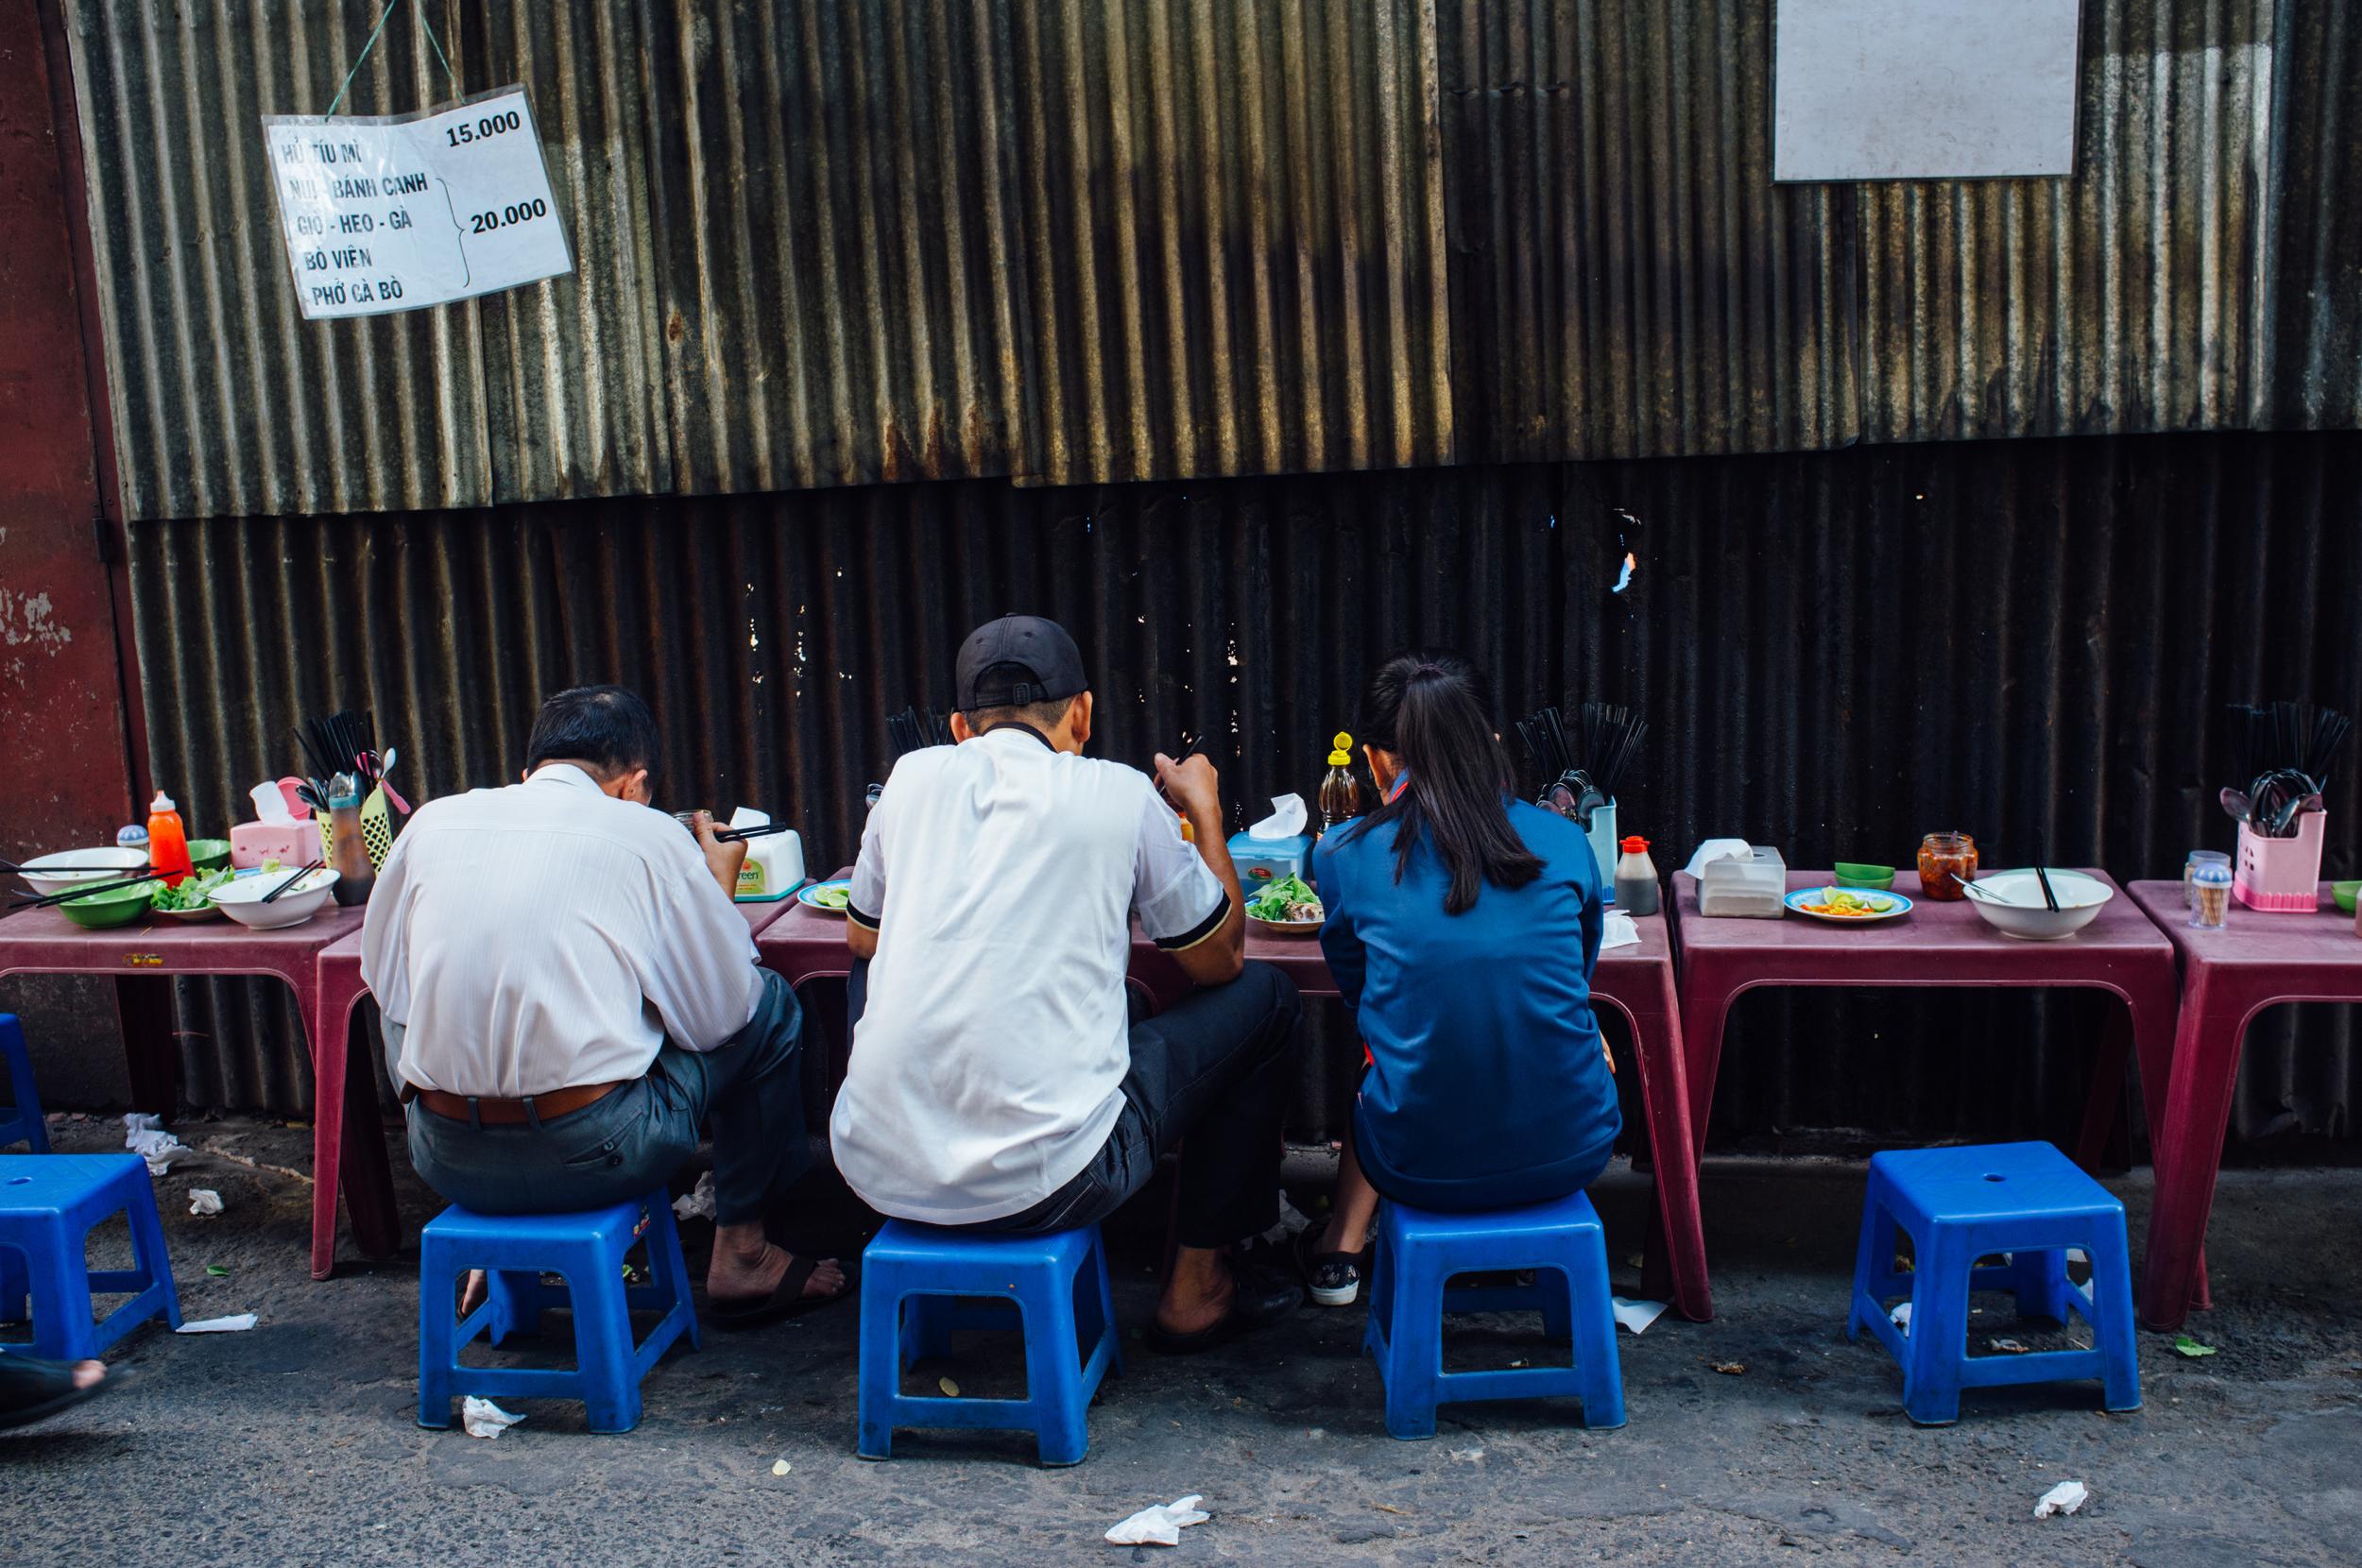 Saigon: alley lunch